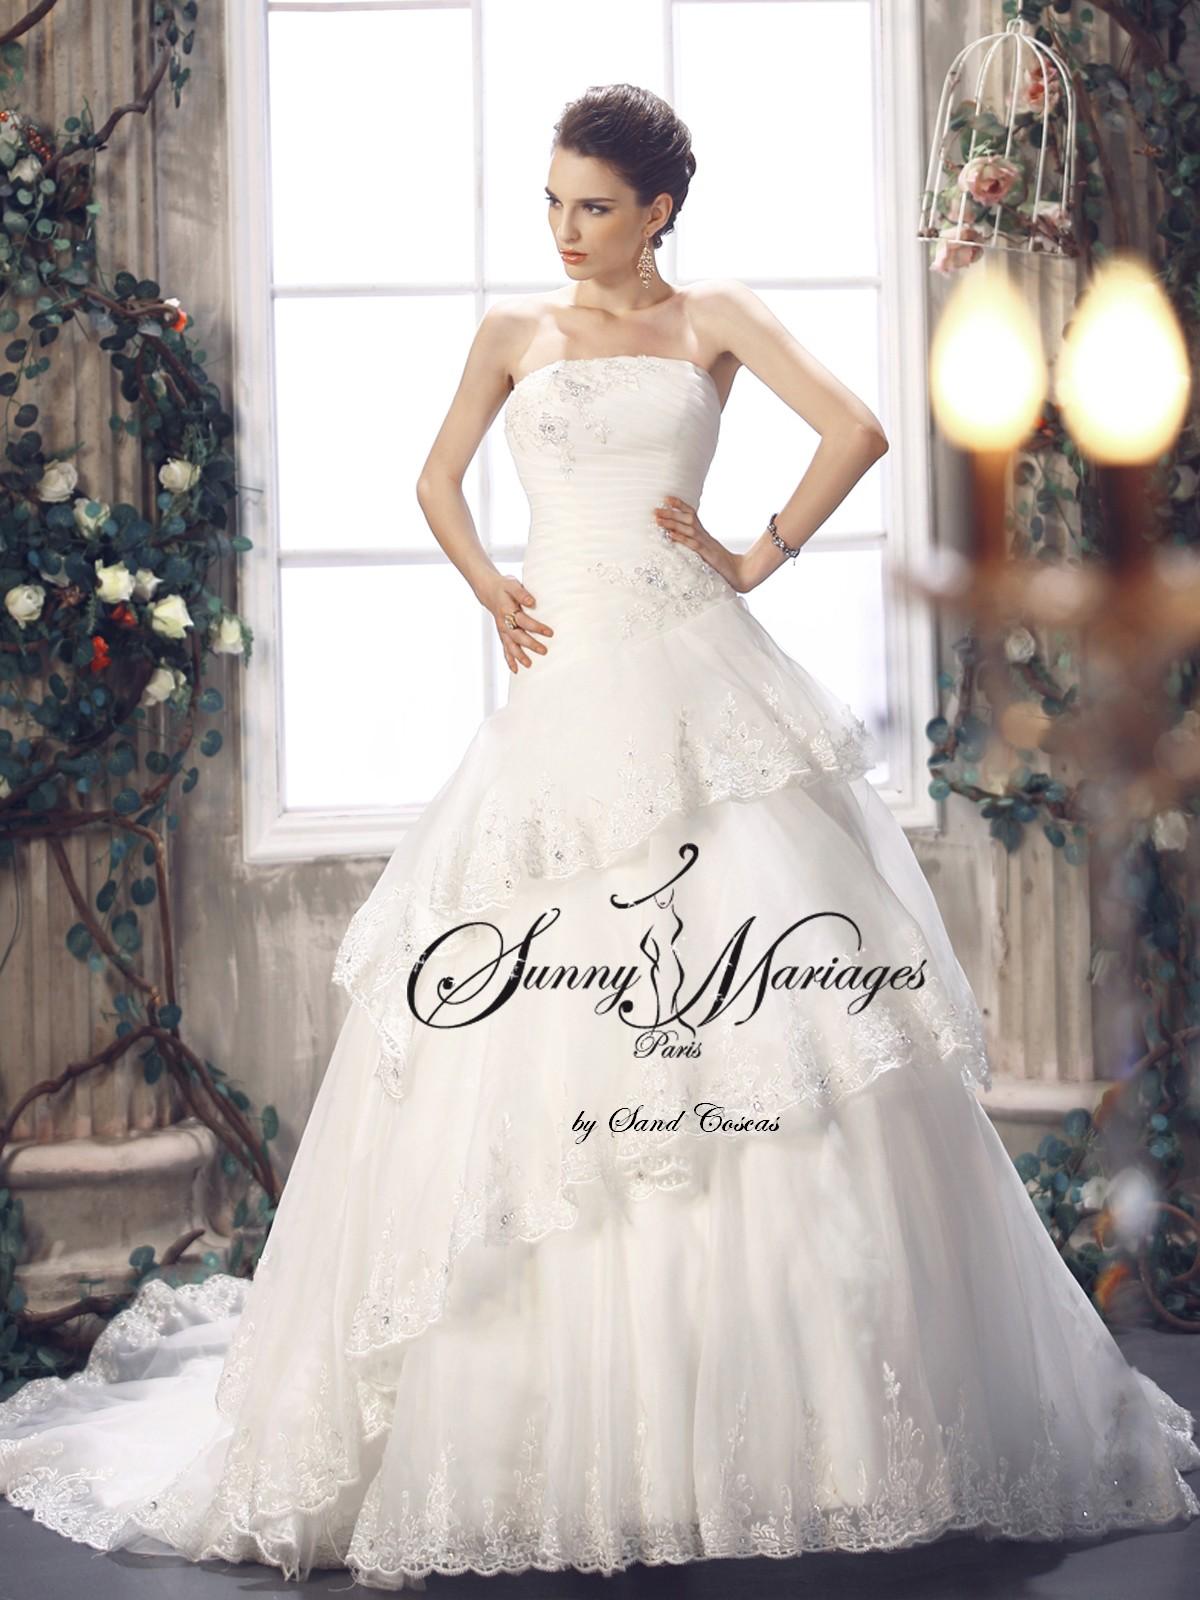 robe de mariee dentelle forme princesse en ligne et pas cher sunny mariage. Black Bedroom Furniture Sets. Home Design Ideas